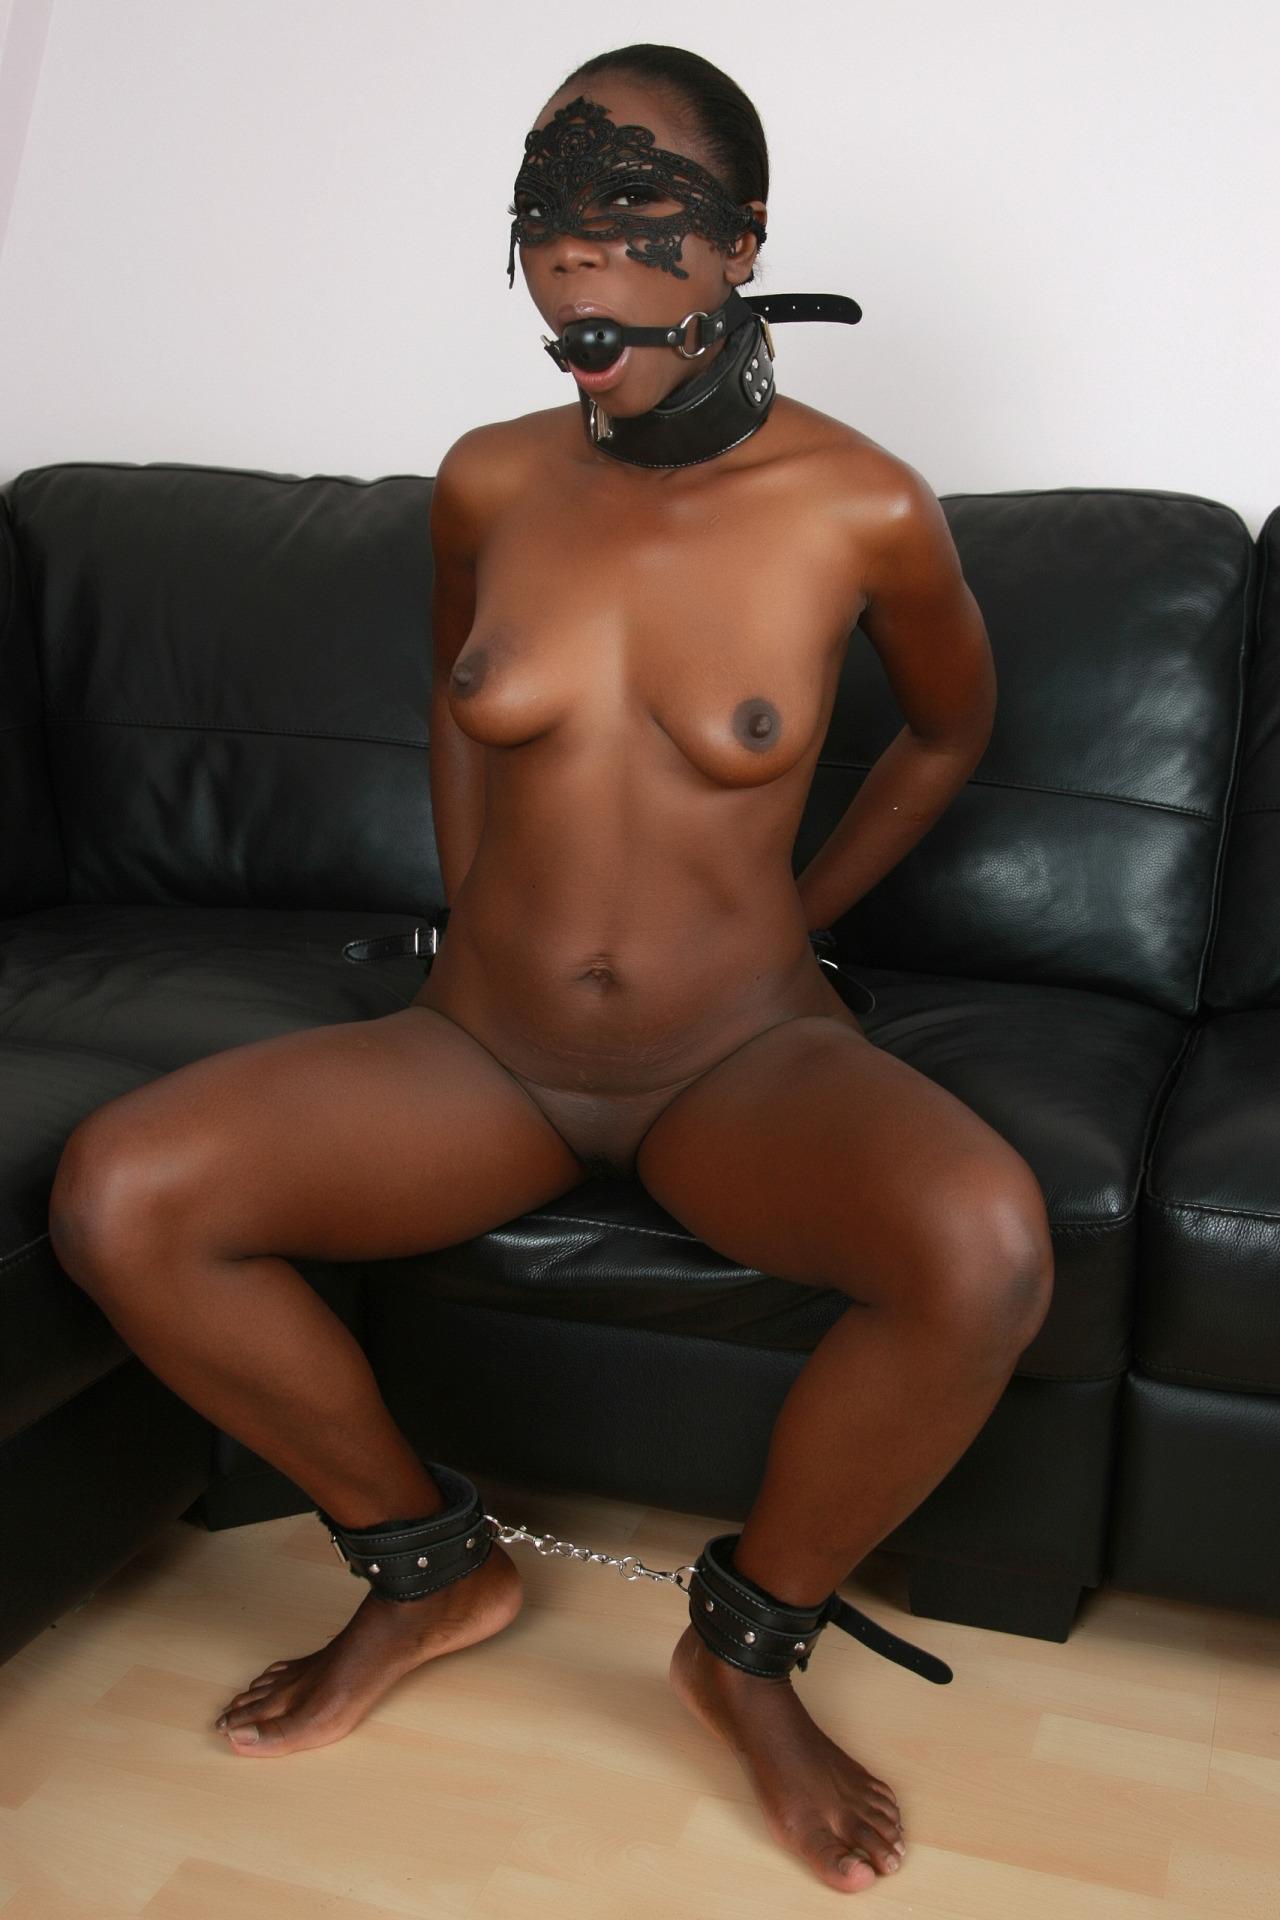 Submissive ebony man